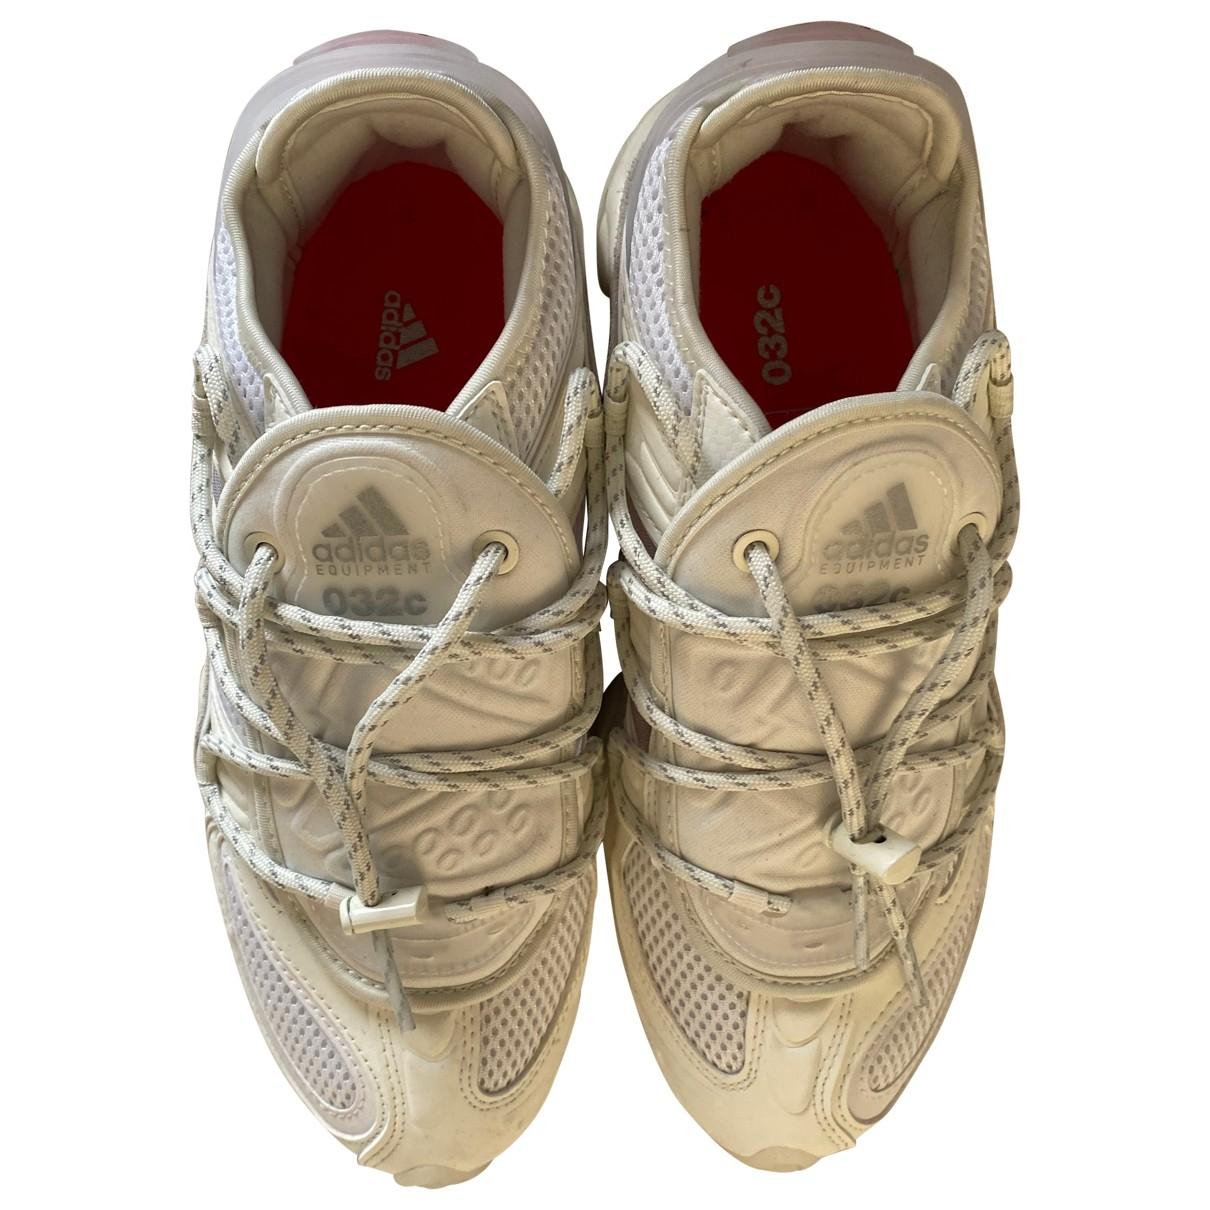 Adidas - Baskets Ozweego pour homme en toile - blanc